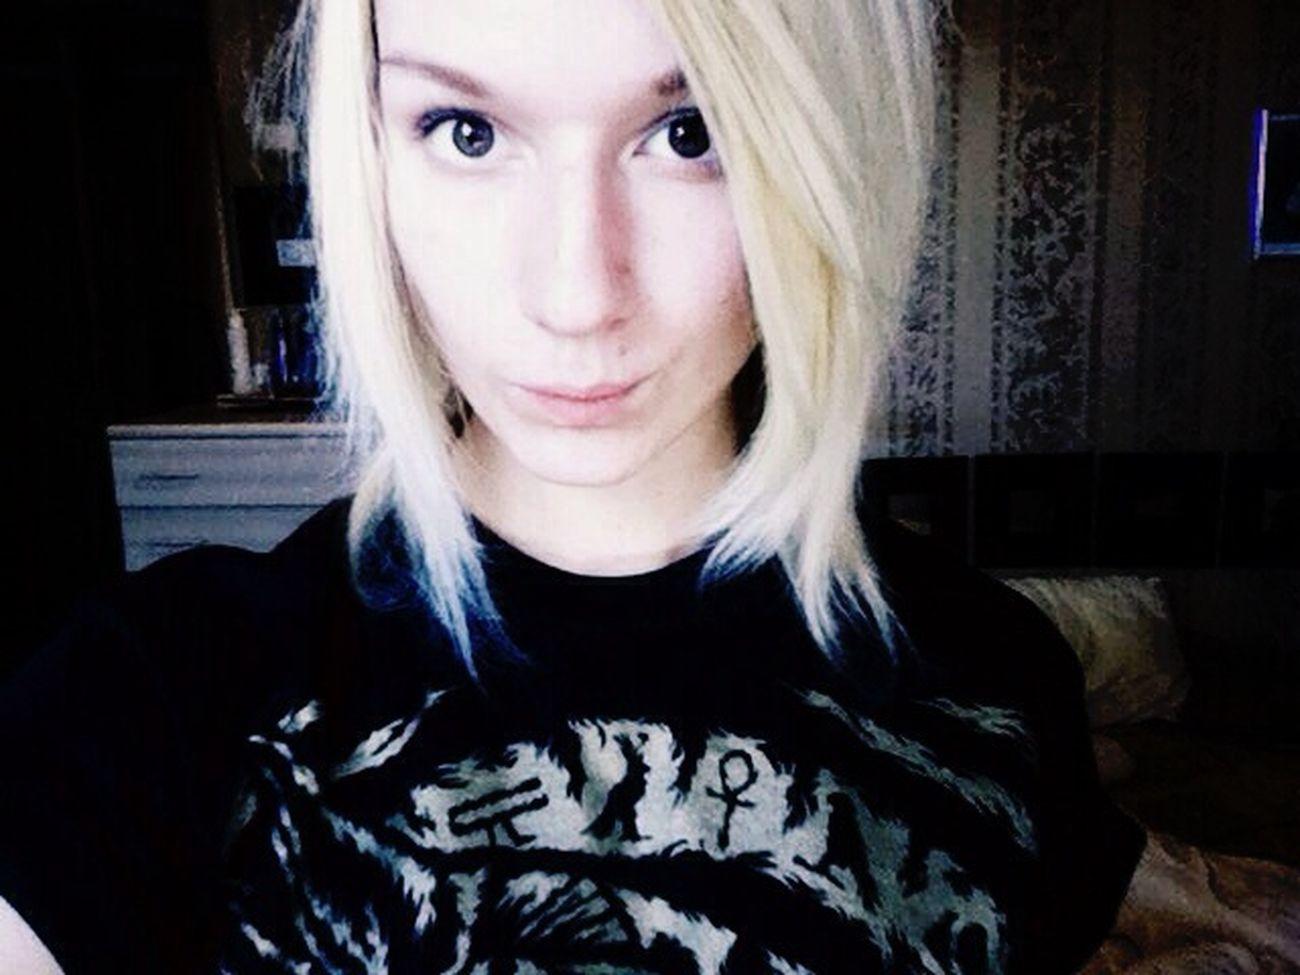 Blond Hair Pretty Selfie Cute Stupid Girl Me LOL